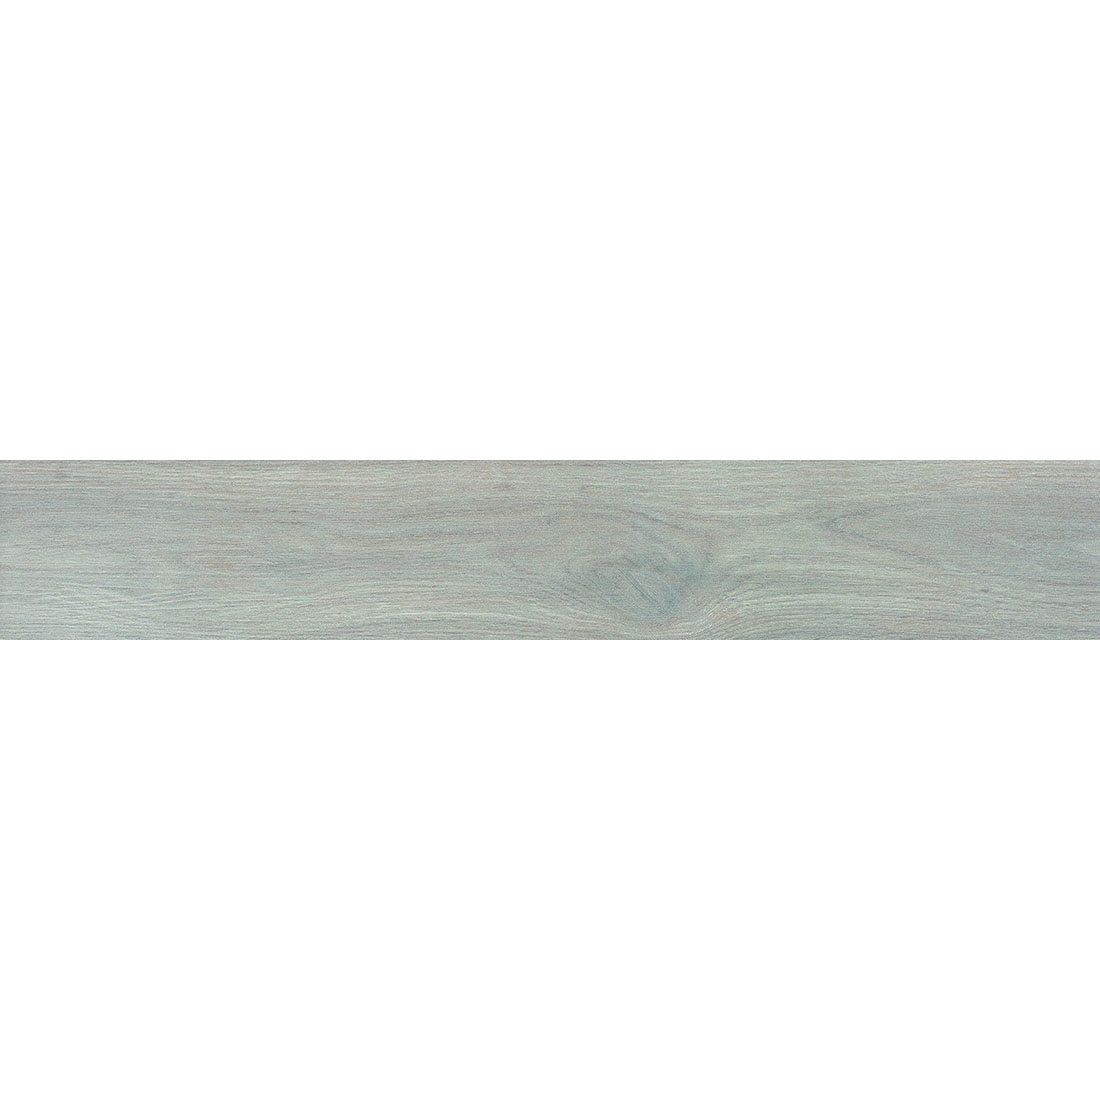 Hardwood 20x120 Gris